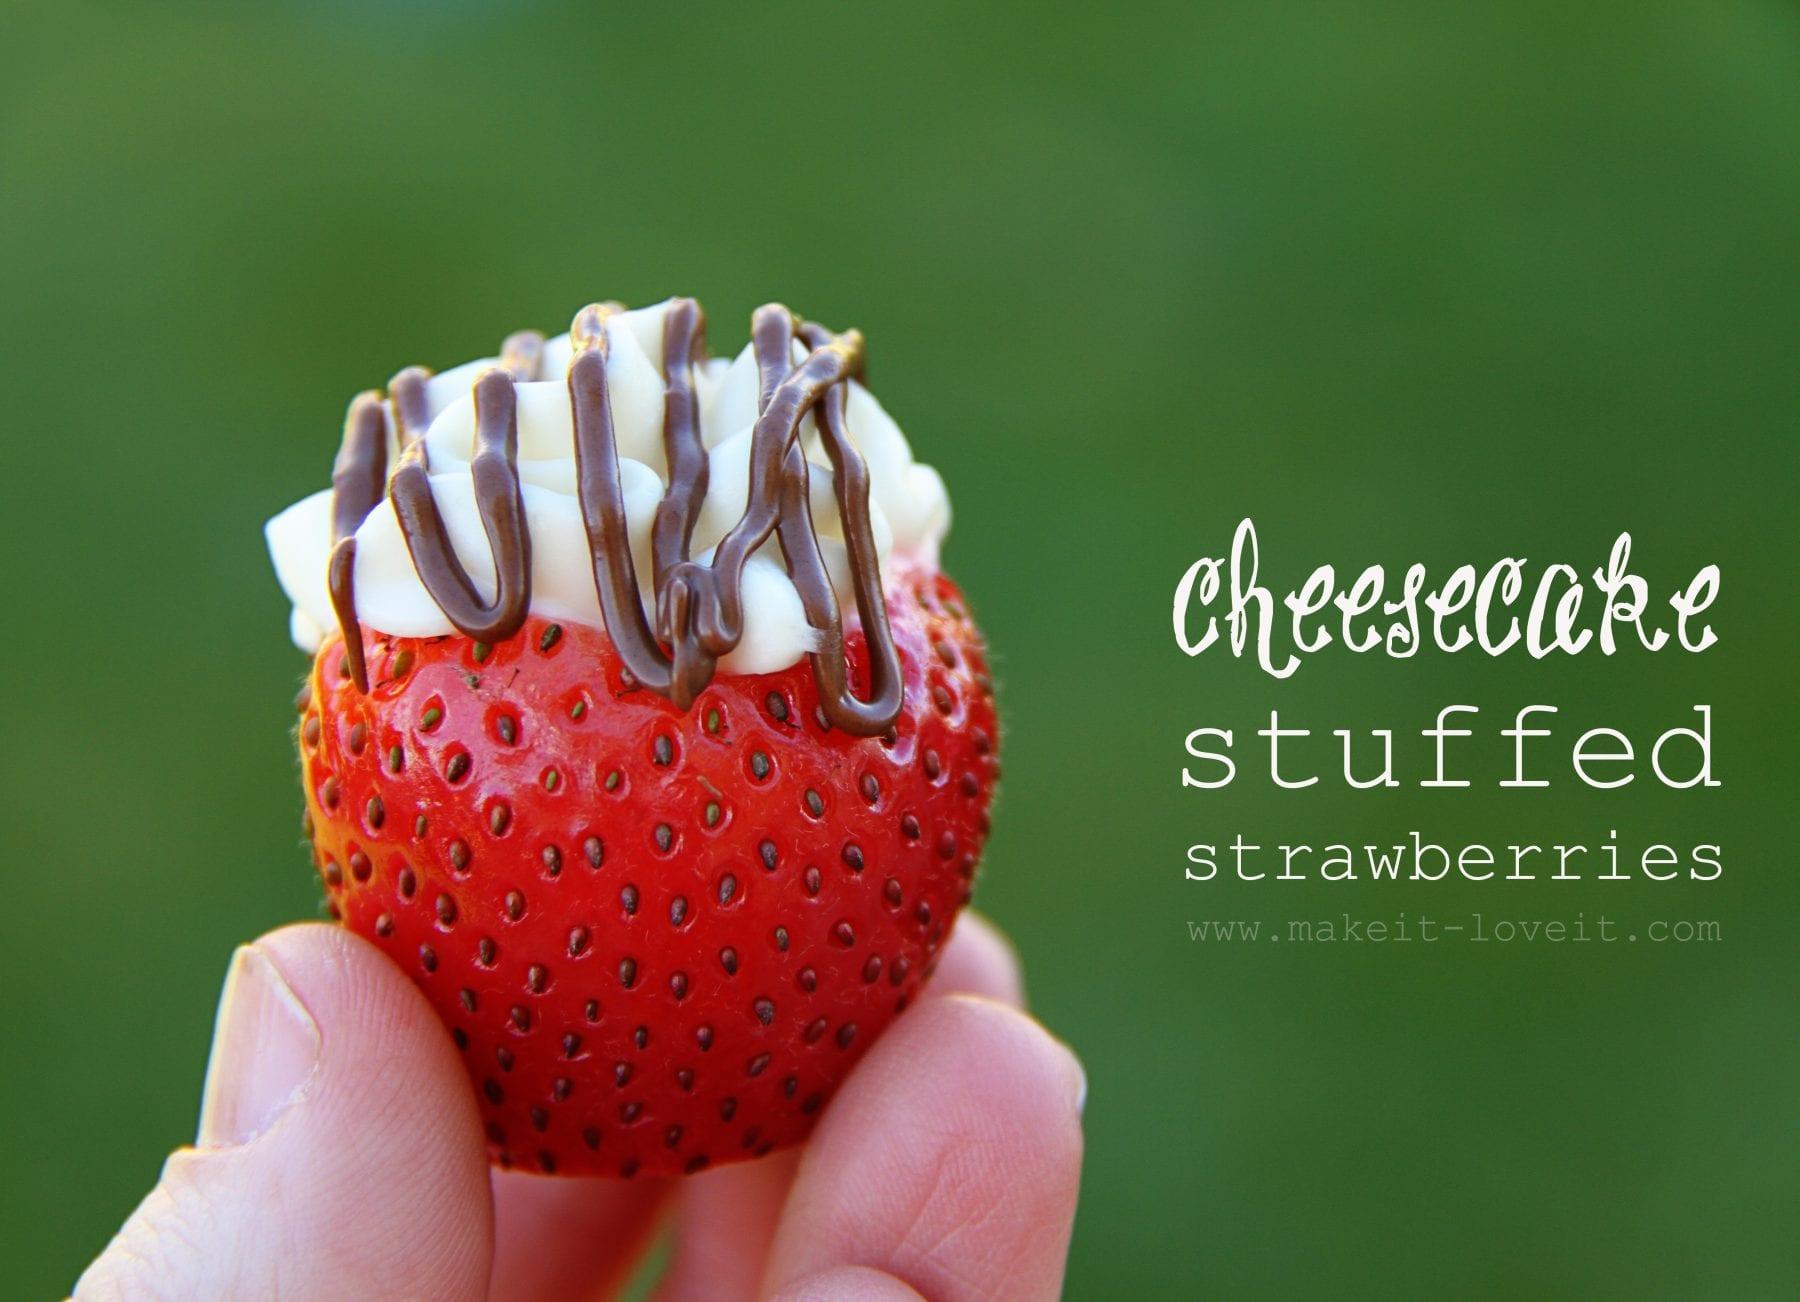 simple and speedy 'Cheesecake Stuffed Strawberries'